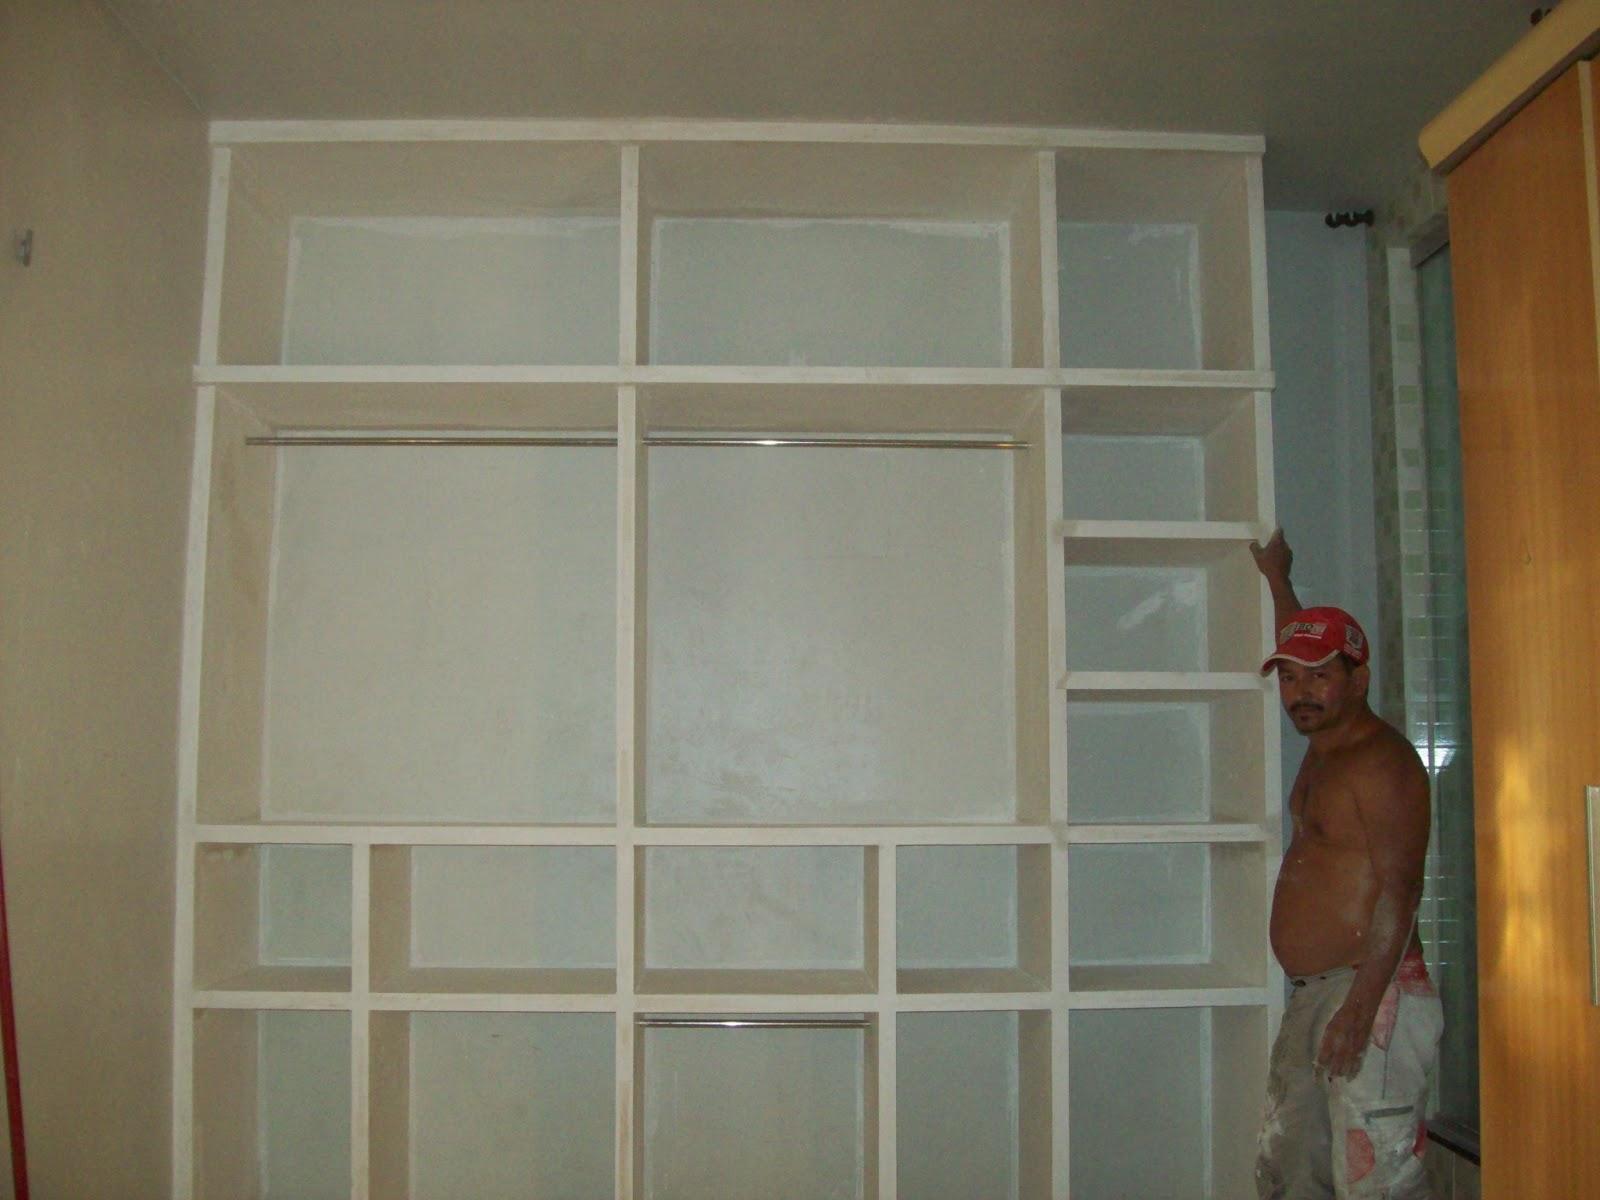 HD wallpapers pintar quarto de casal